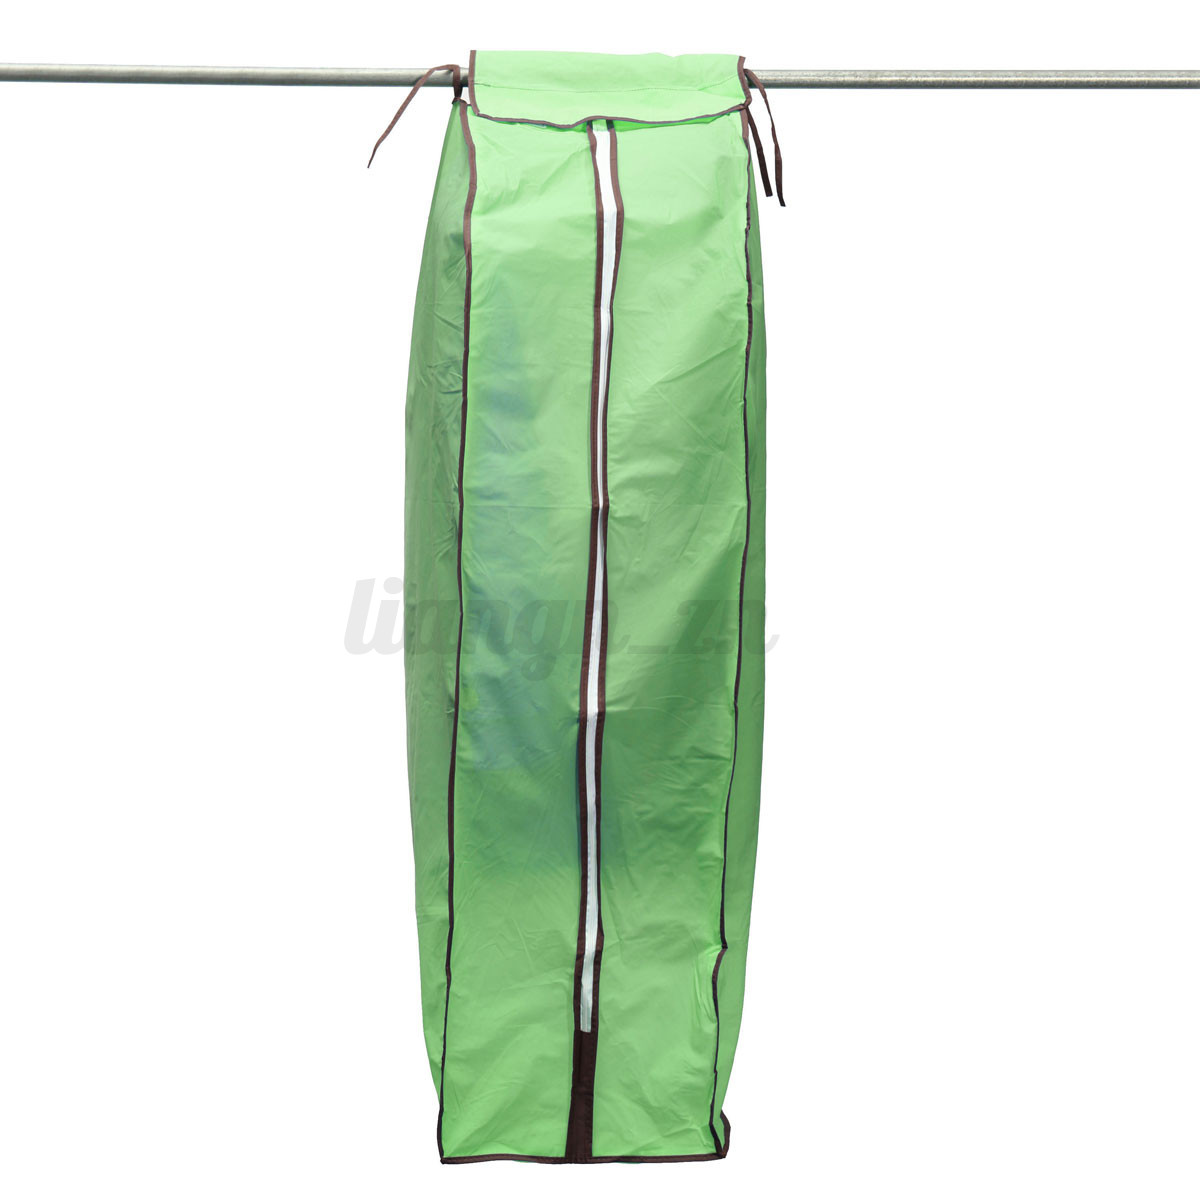 housse sac de suspendu antipoussi re tissu rangement. Black Bedroom Furniture Sets. Home Design Ideas